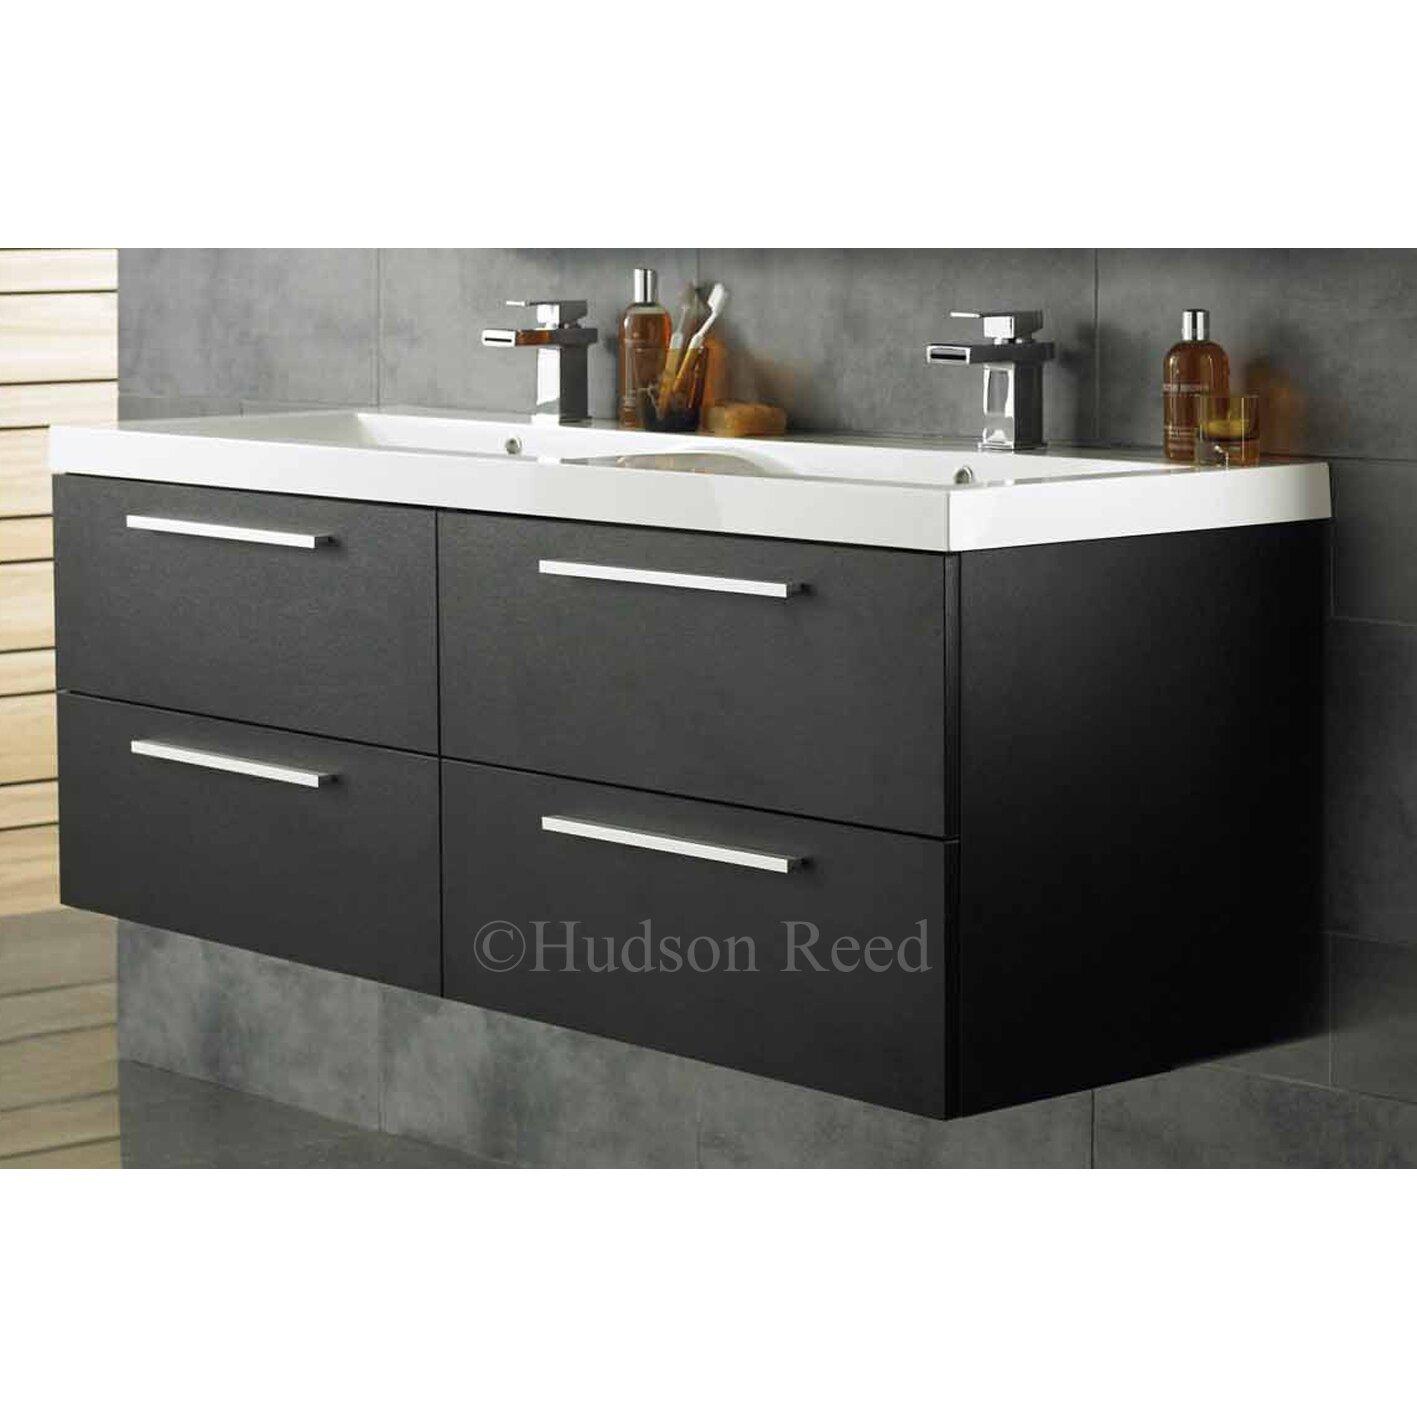 hudson reed quartet 144cm wall mounted double basin vanity. Black Bedroom Furniture Sets. Home Design Ideas